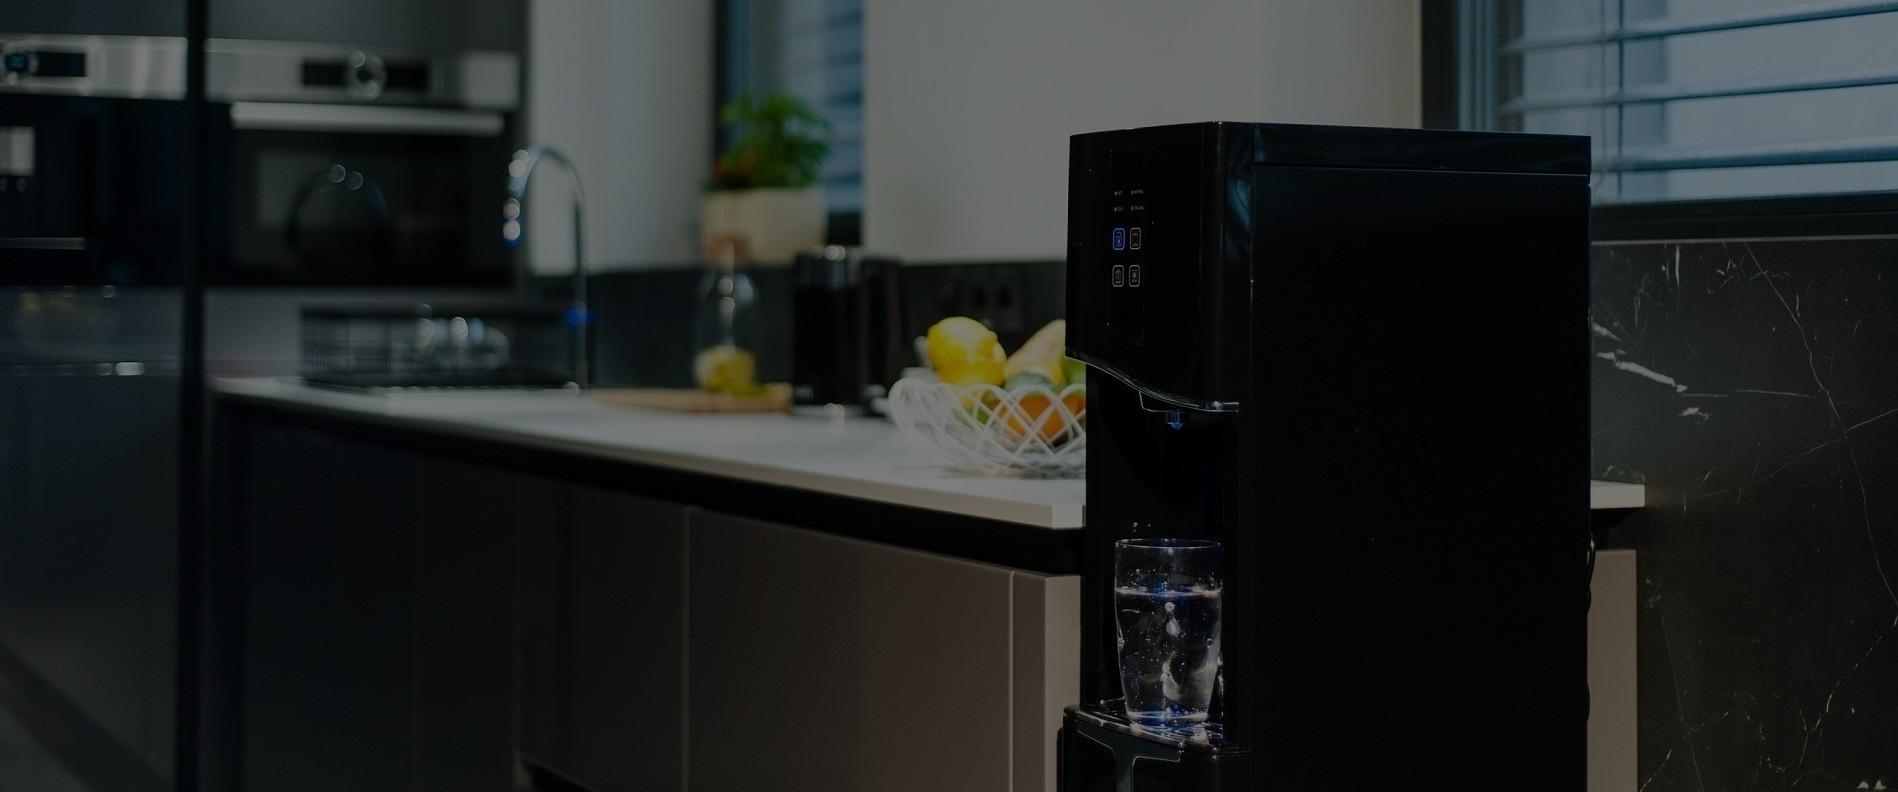 Modern Soda Water Dispenser